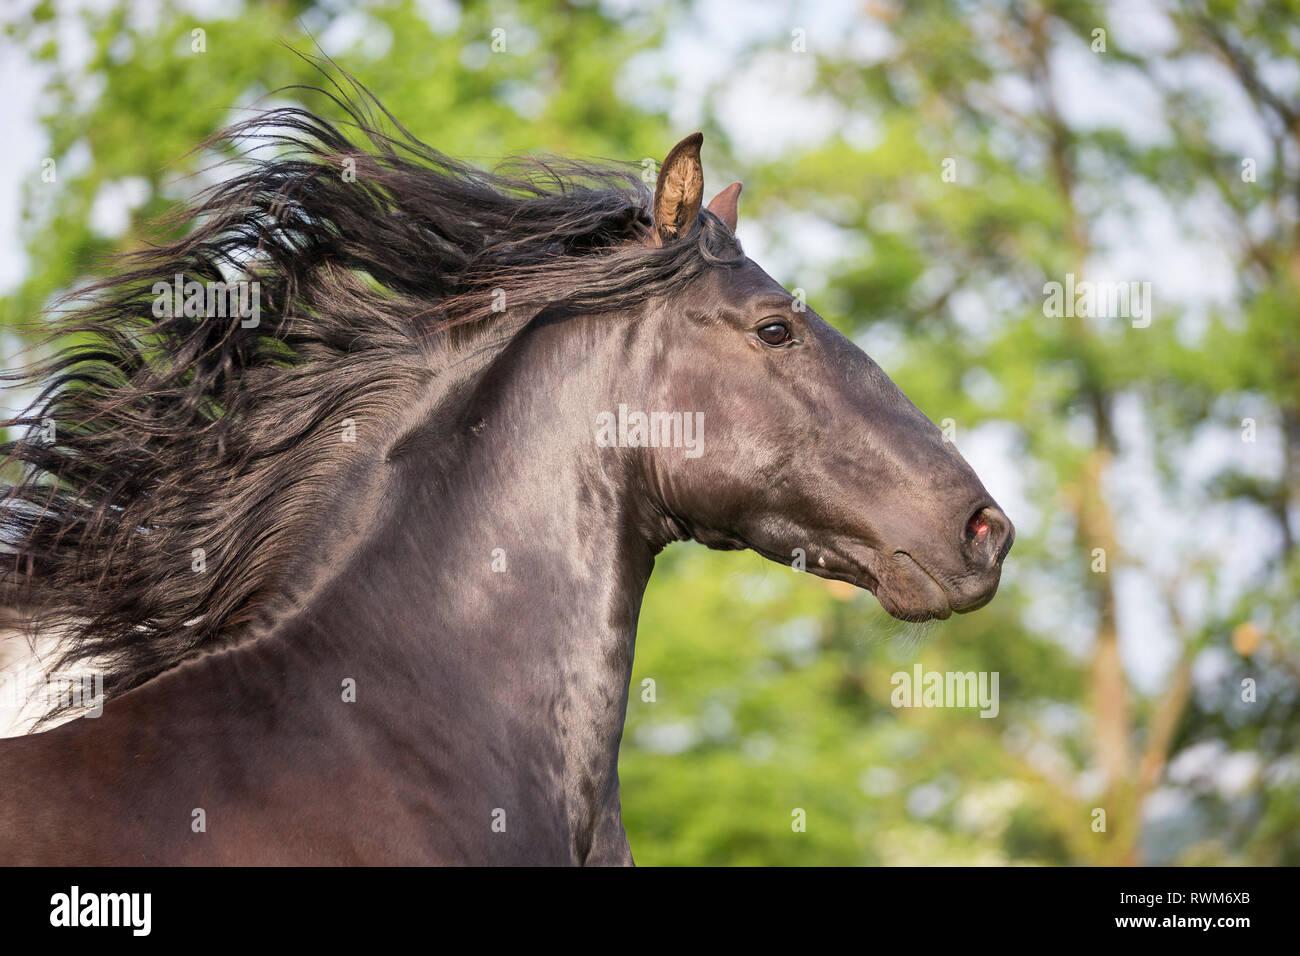 Lusitano. Portrait of juvenile black stallion with mane flowing. Switzerland - Stock Image